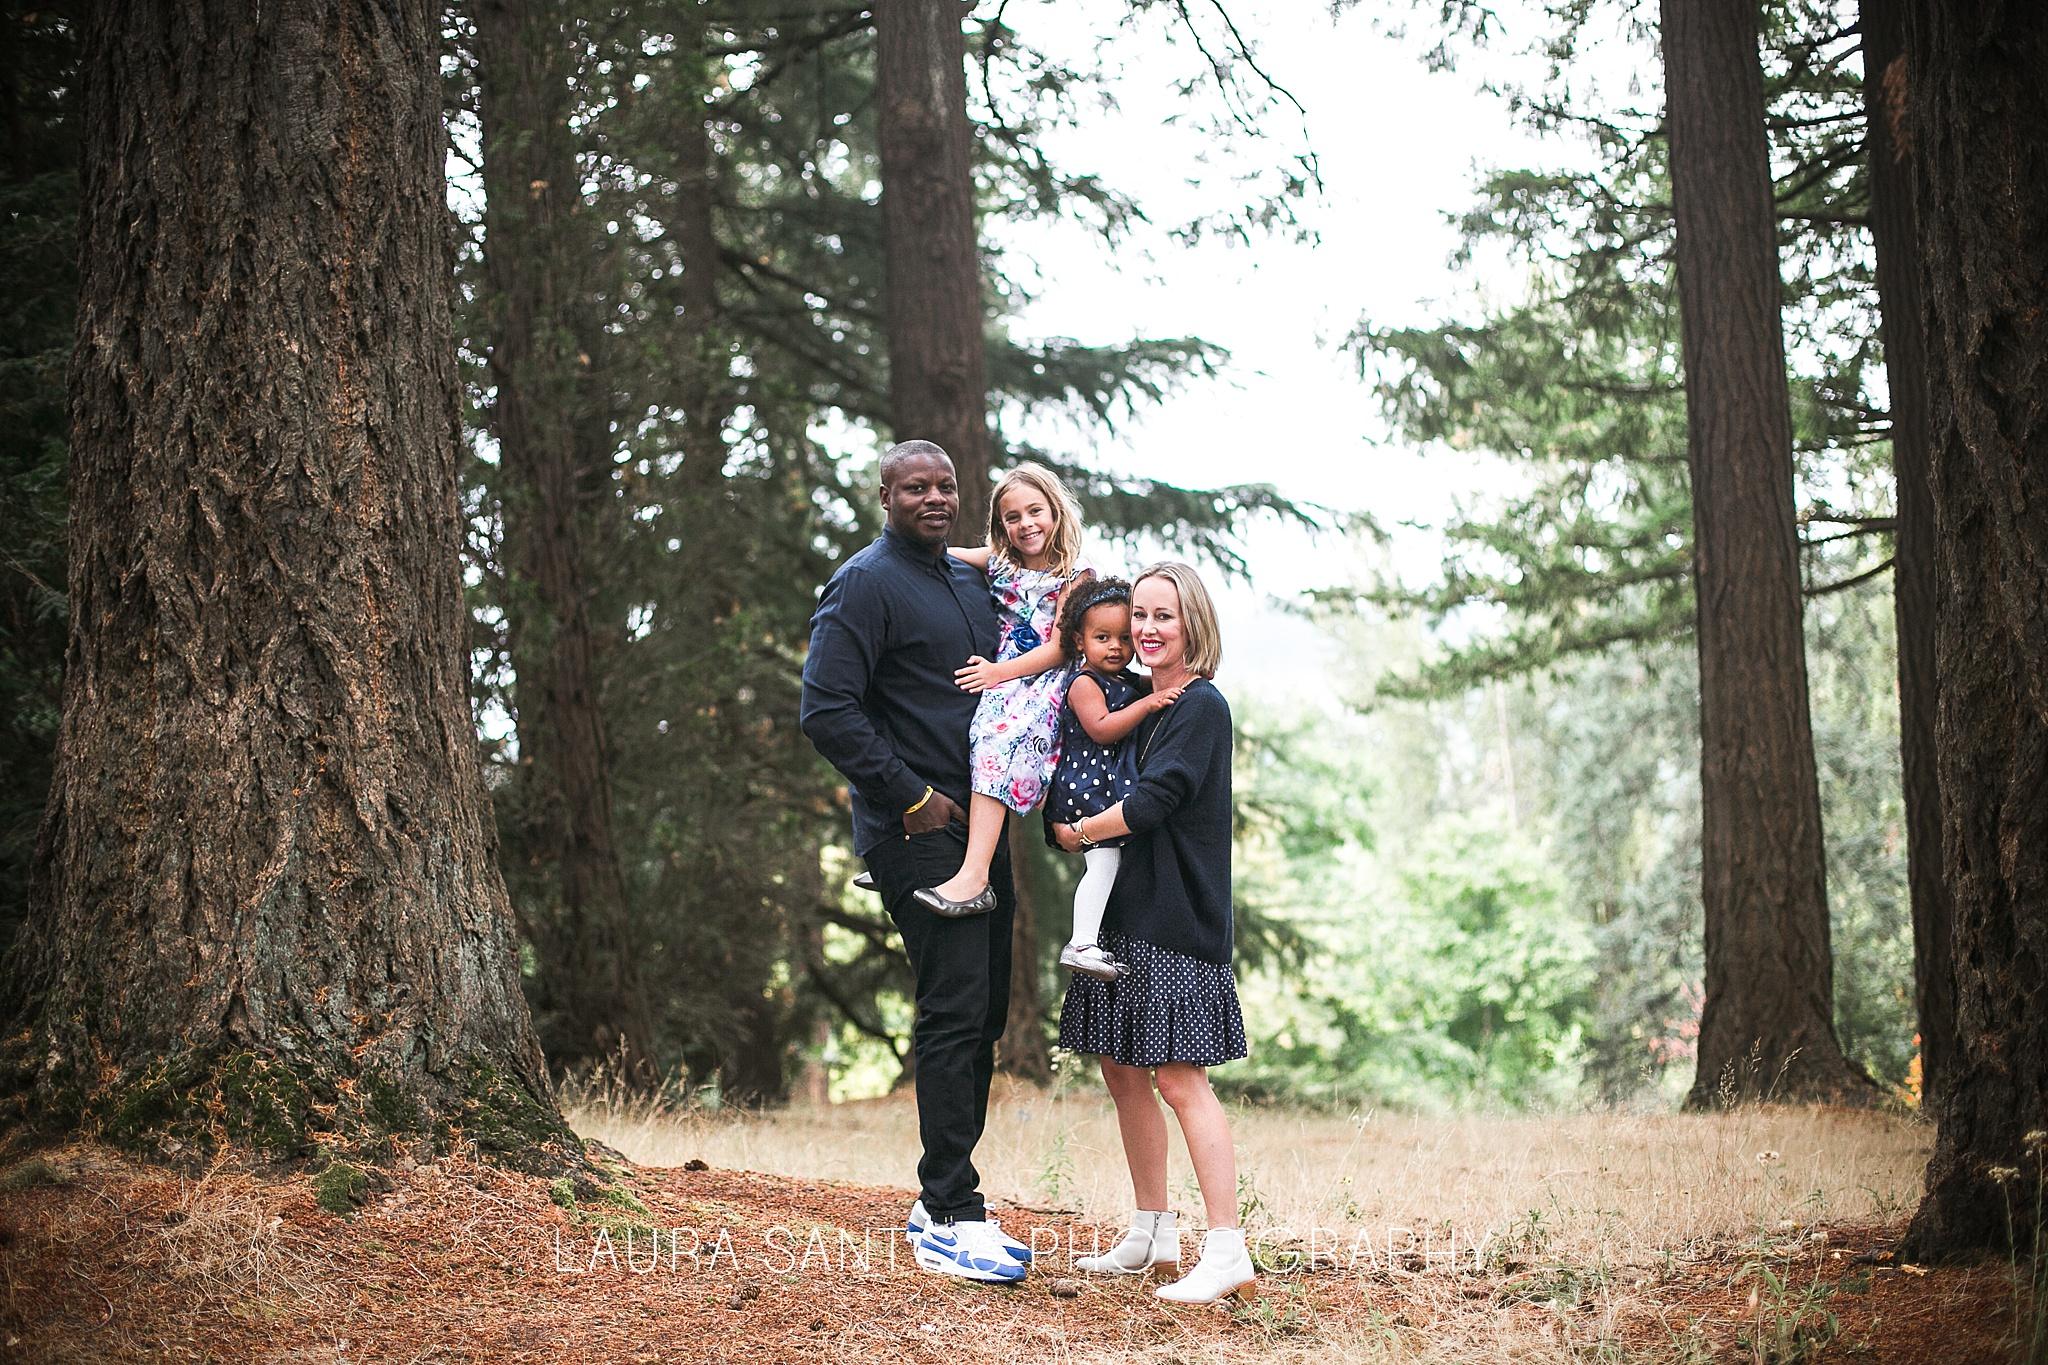 Laura Santos Photography Portland Oregon Family Photographer_0698.jpg